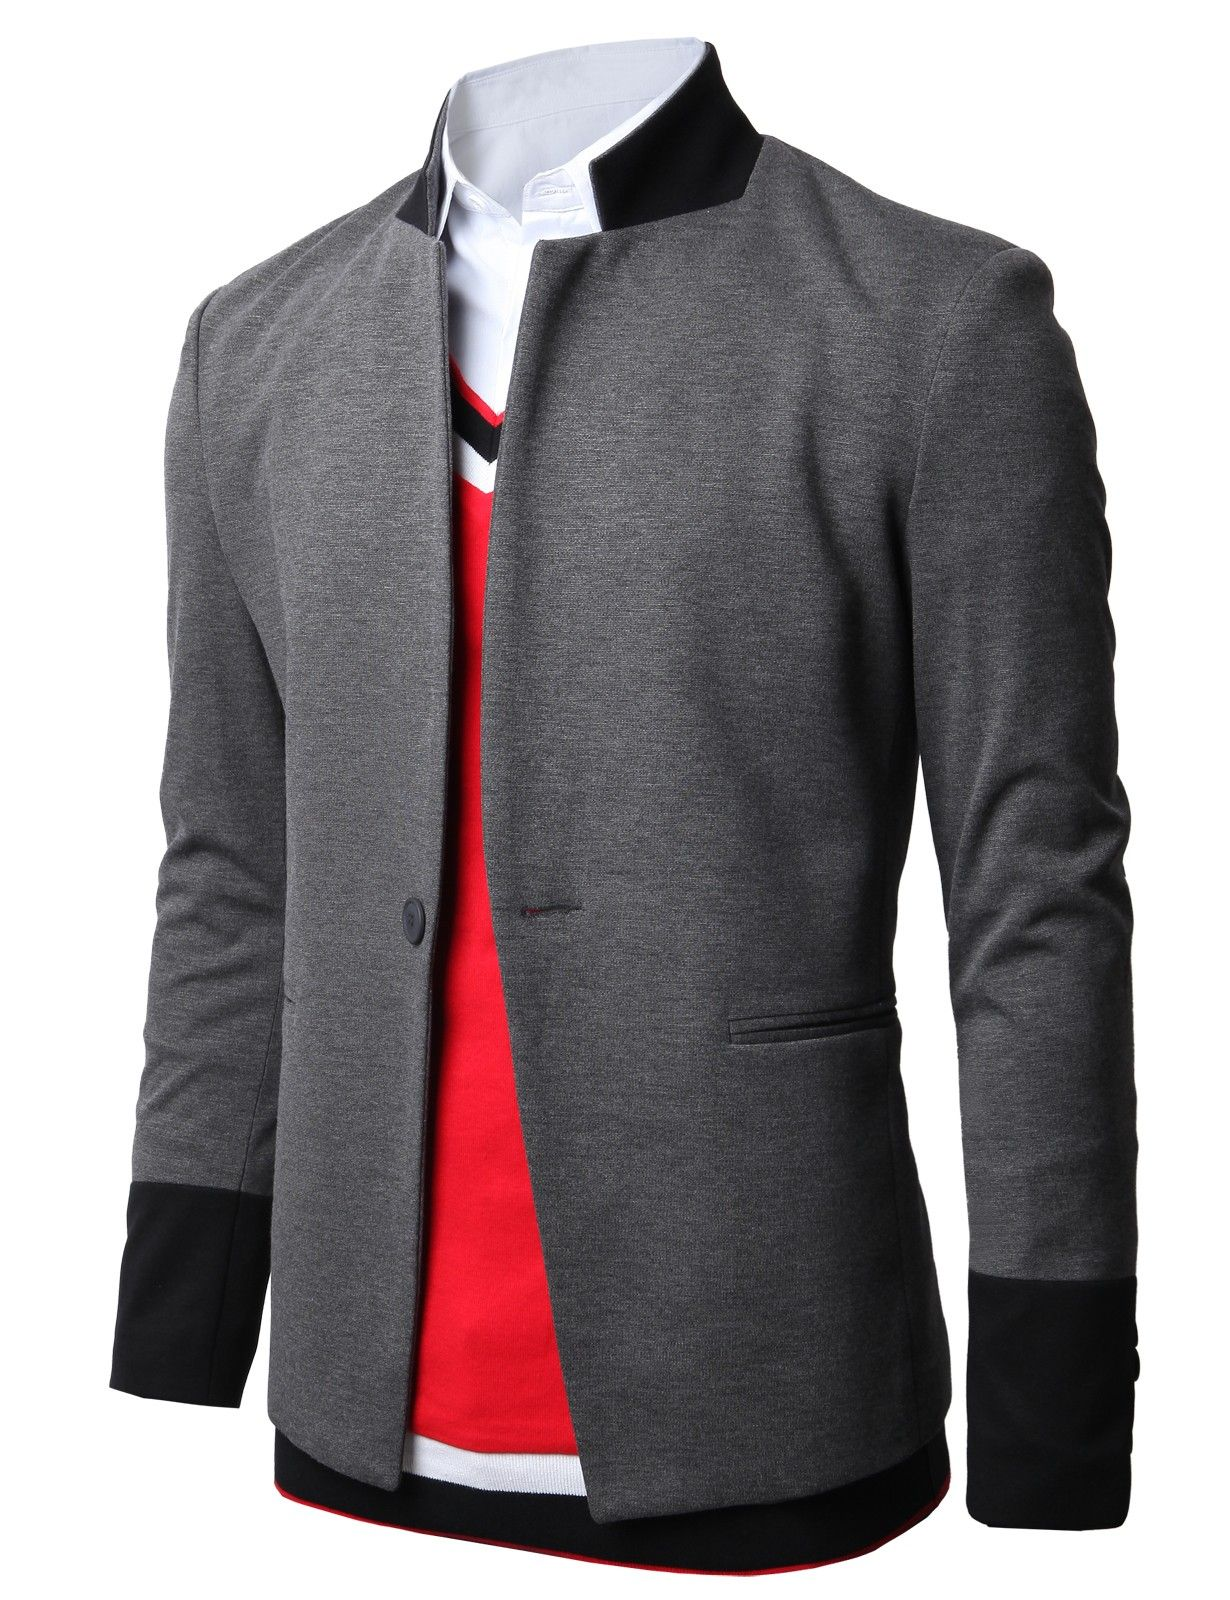 600a3157a27 Doublju Mens One Button Blazer Jackets with Mandarin Collar Ponte Fabric  (JGSK04)  doublju